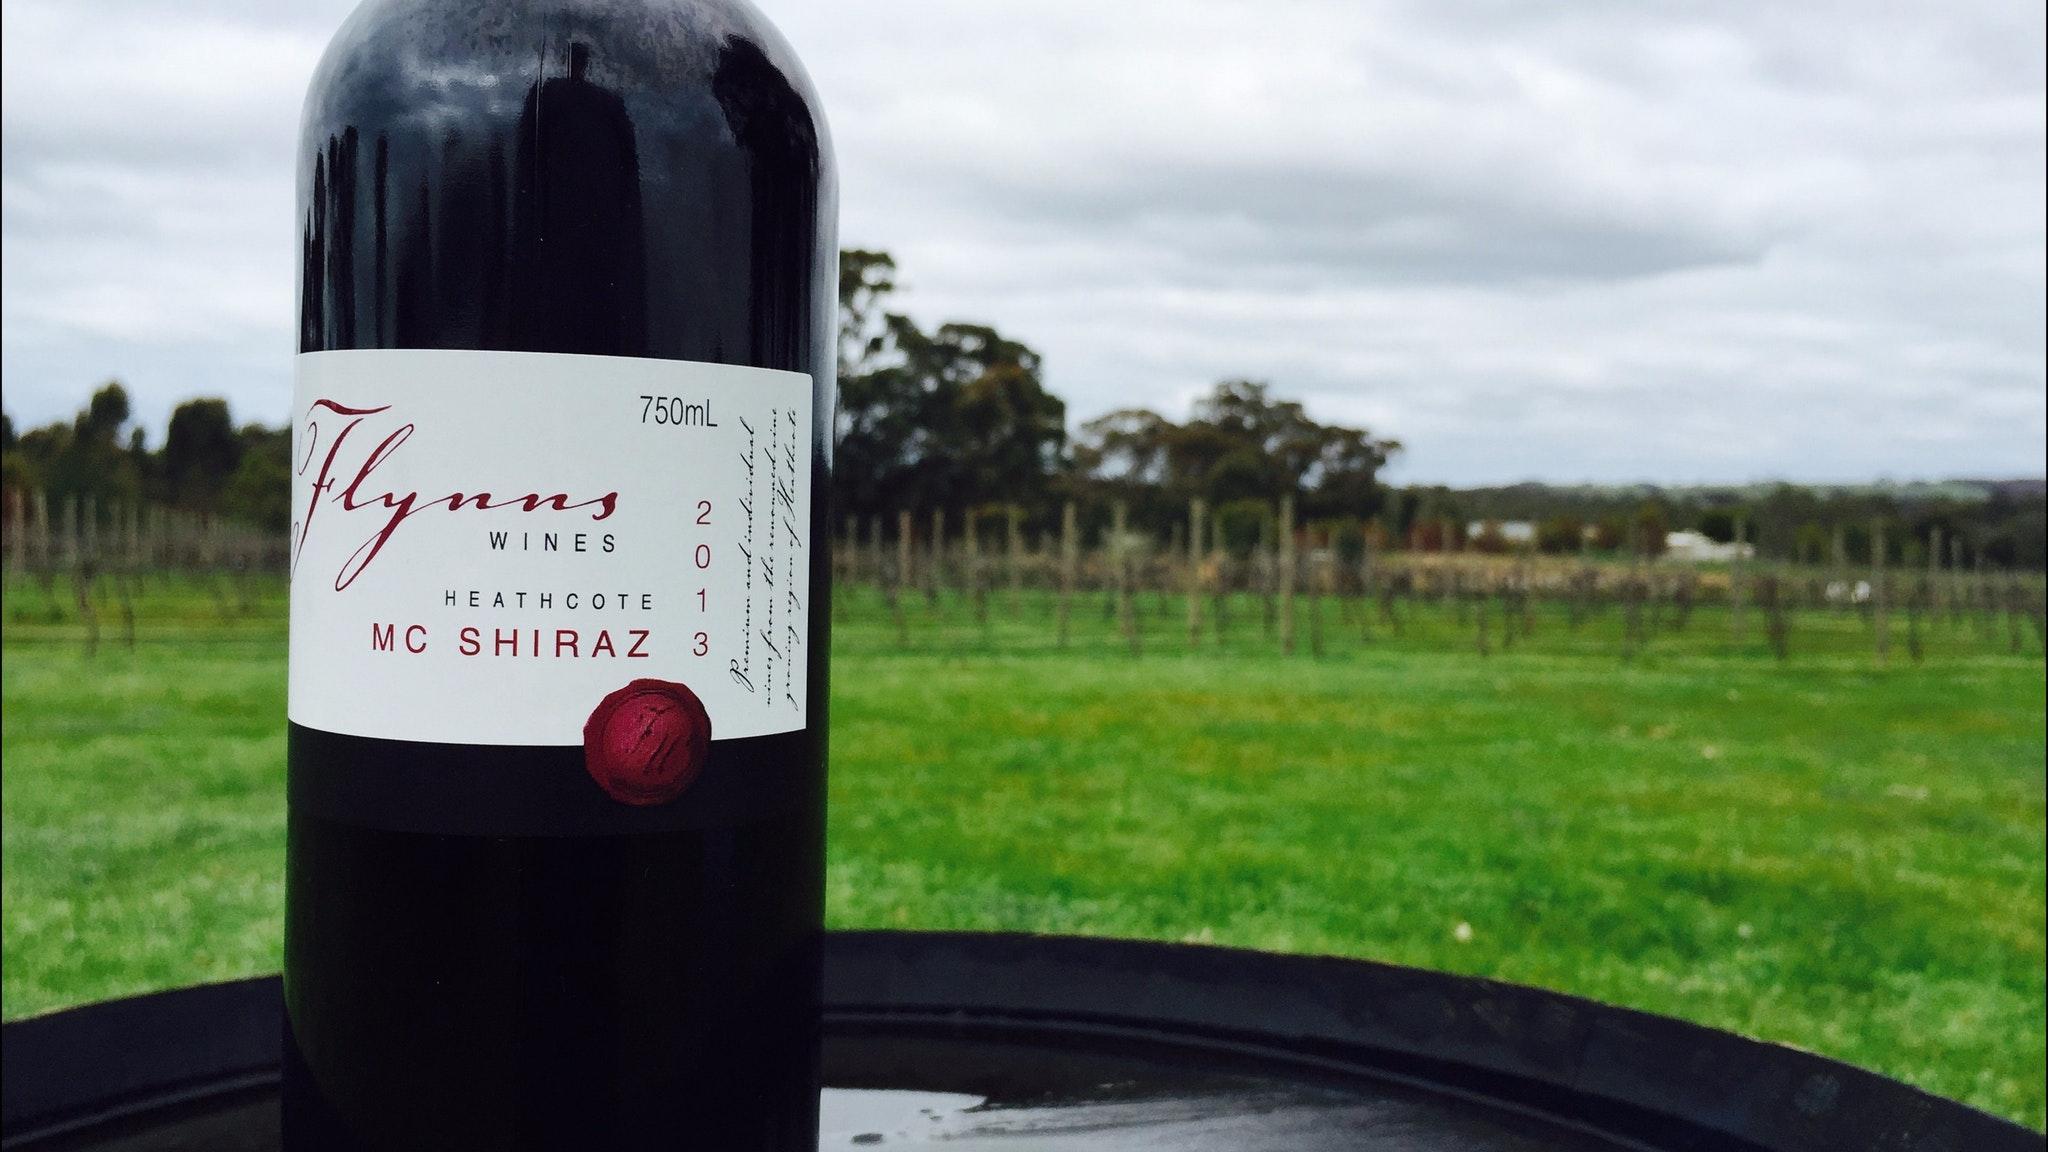 Heathcote Wine Tour